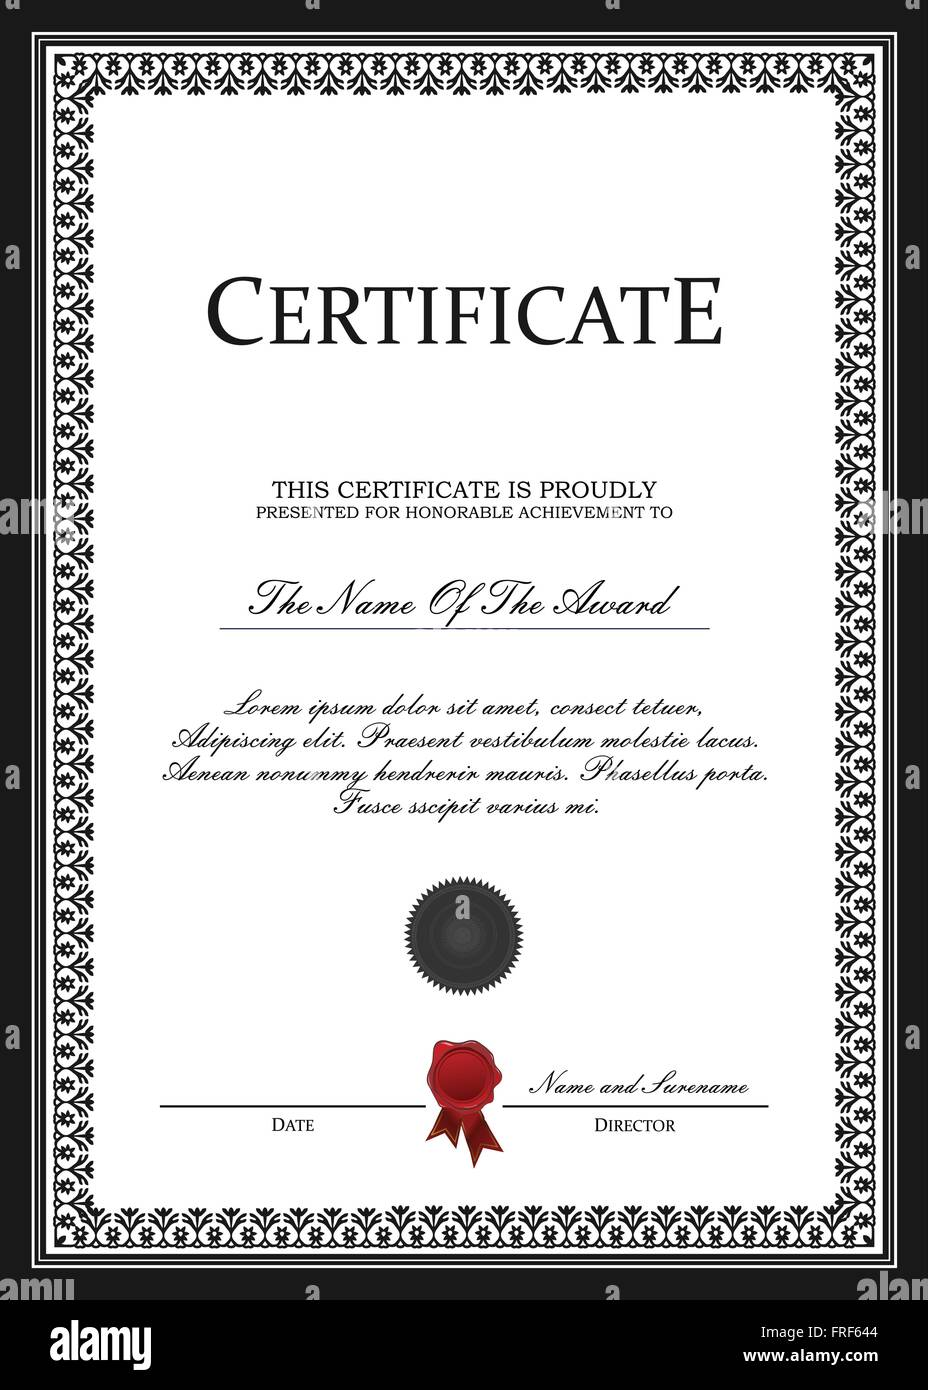 Antique Stock Certificate Stock Photos & Antique Stock Certificate ...